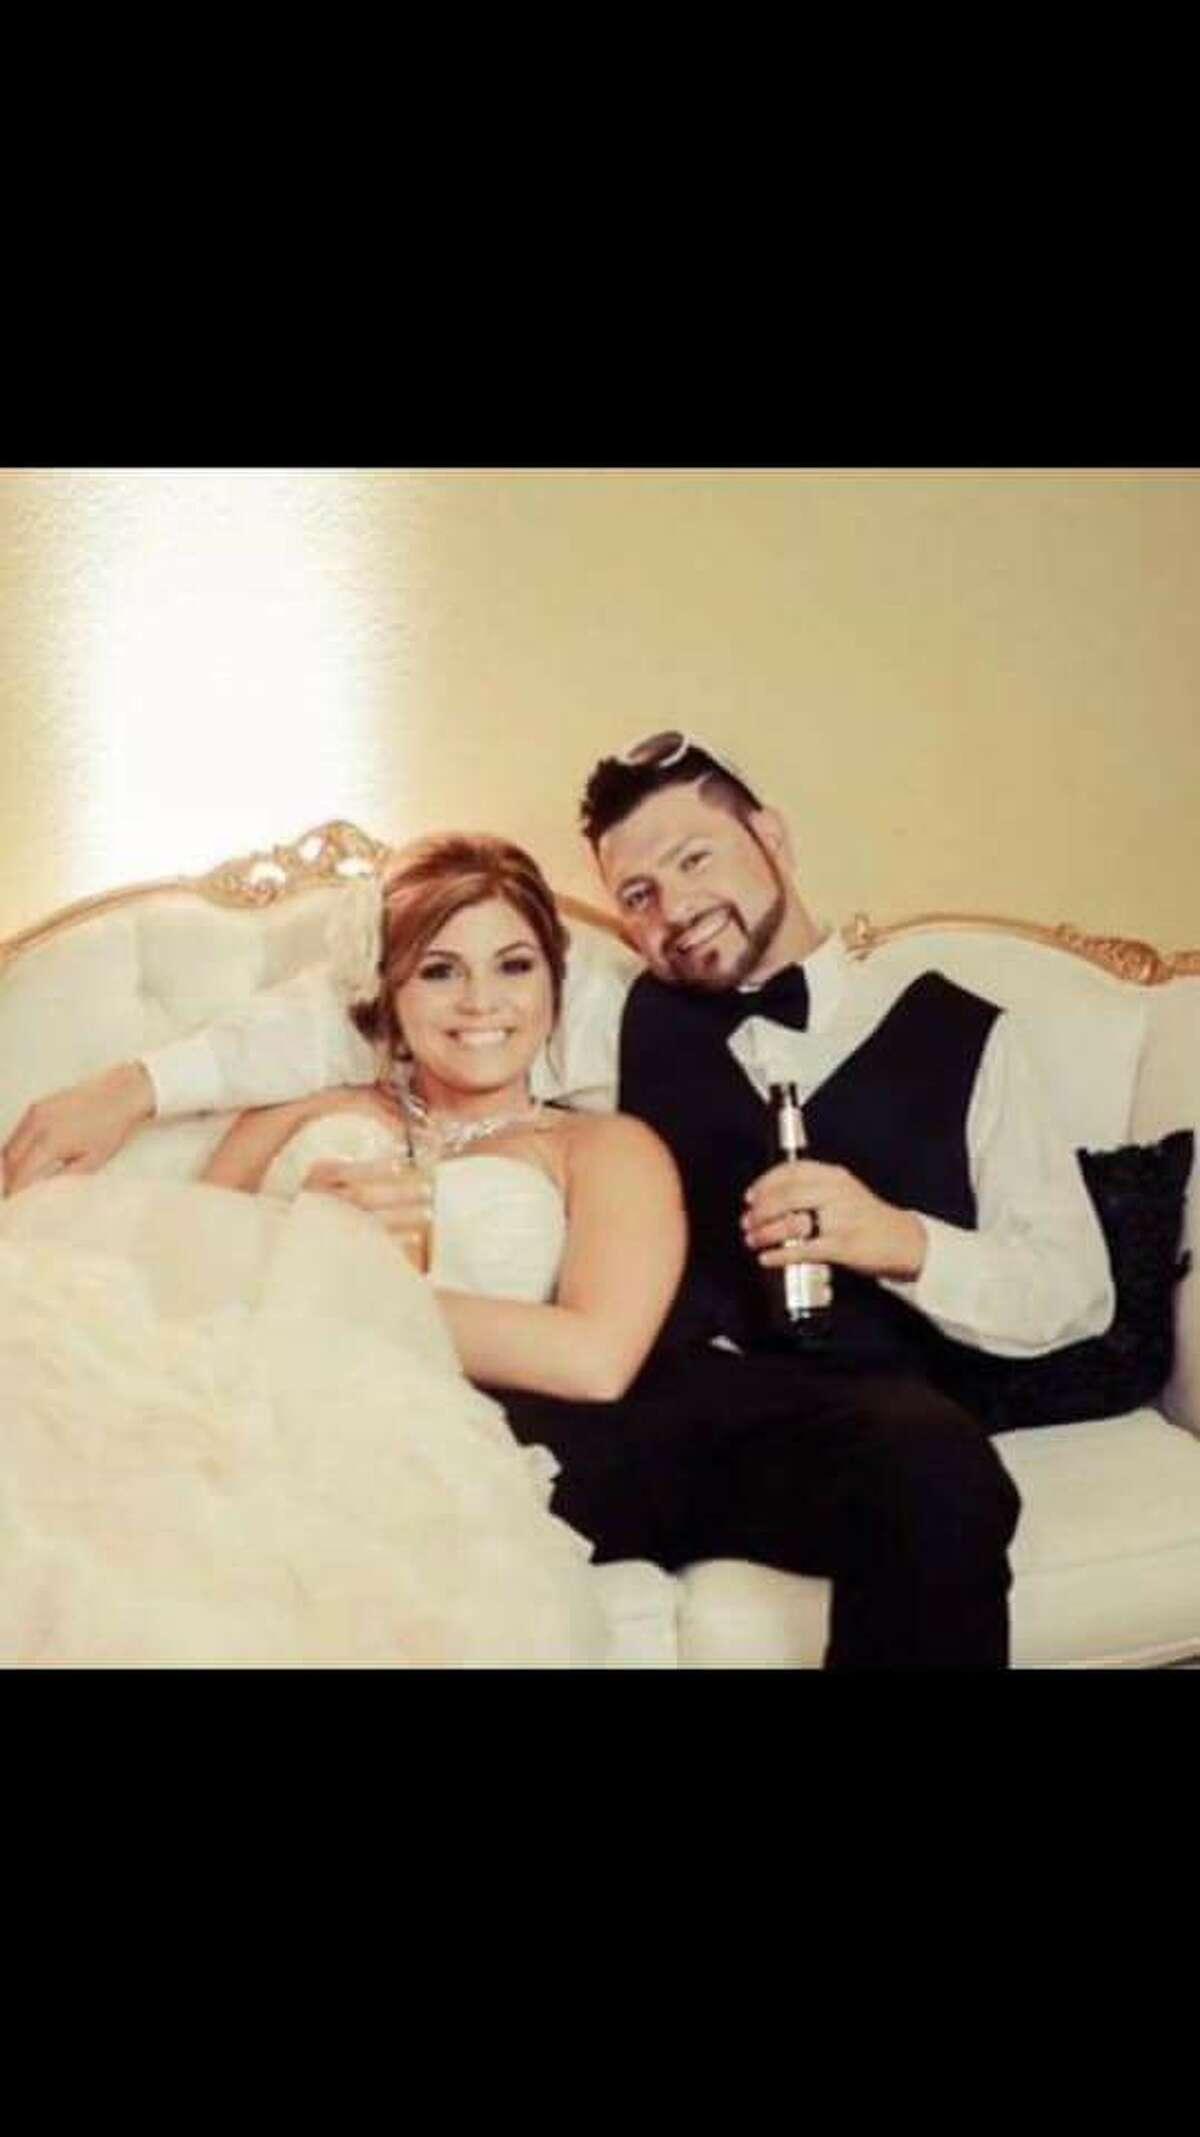 Jason Butler and Rachel Butler